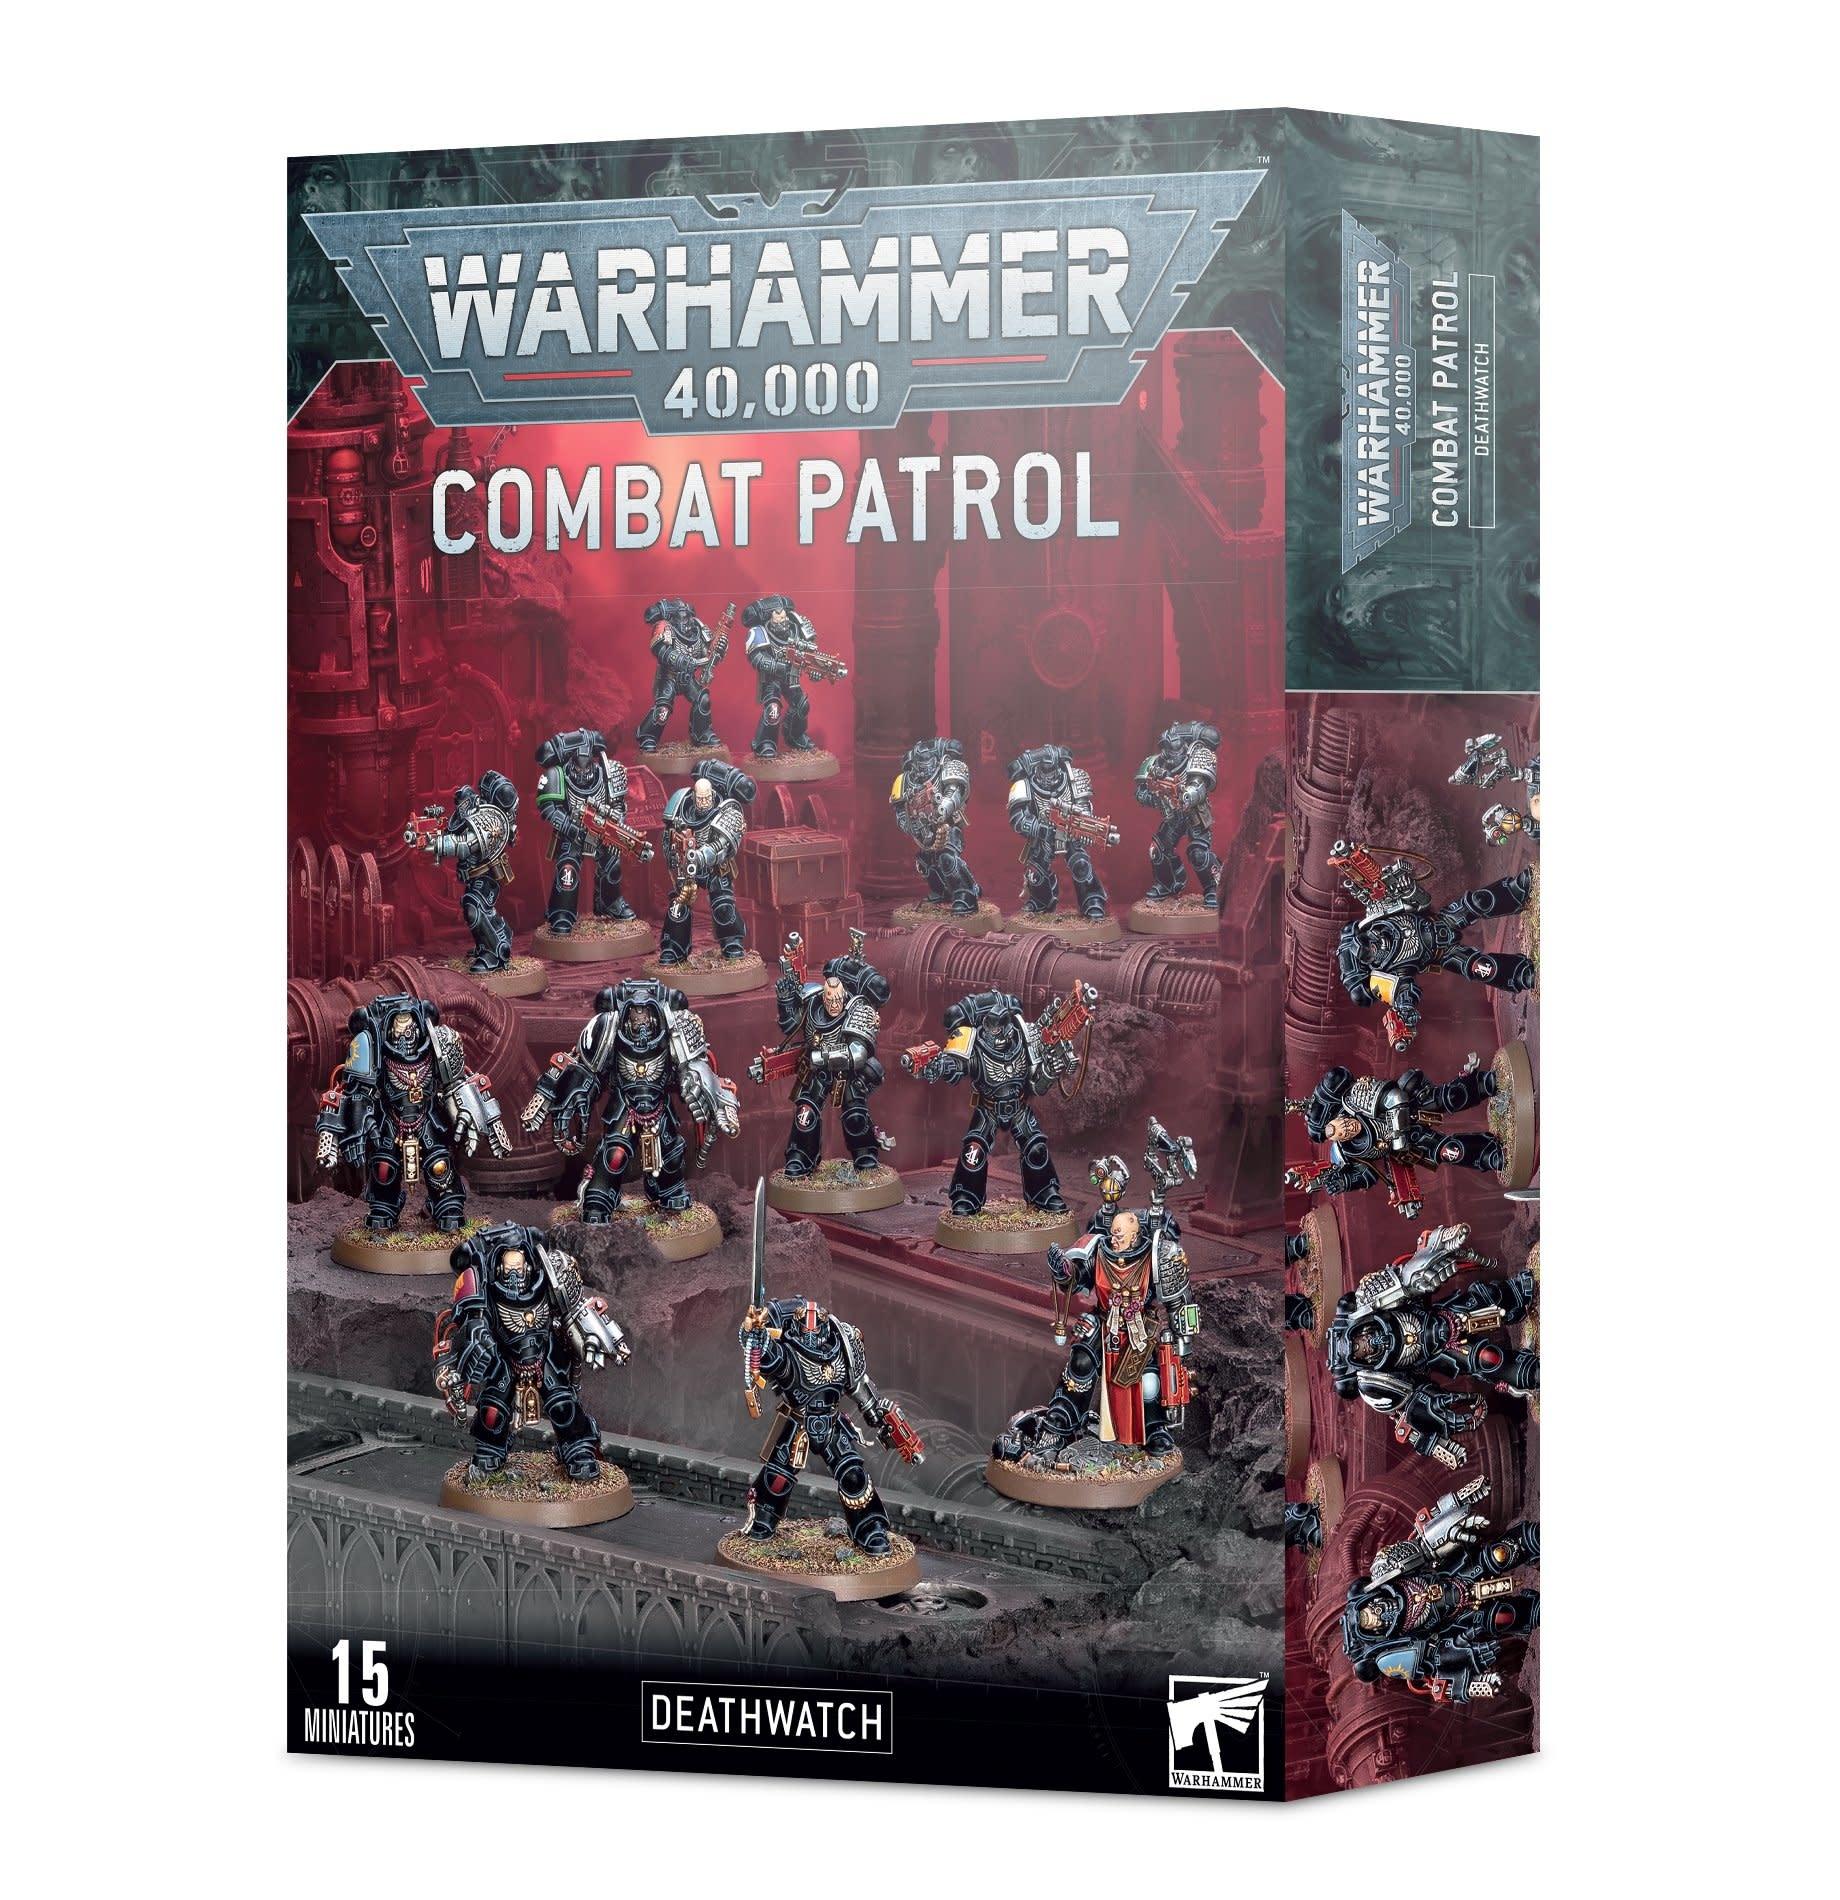 Games Workshop Combat Patrol: Deathwatch